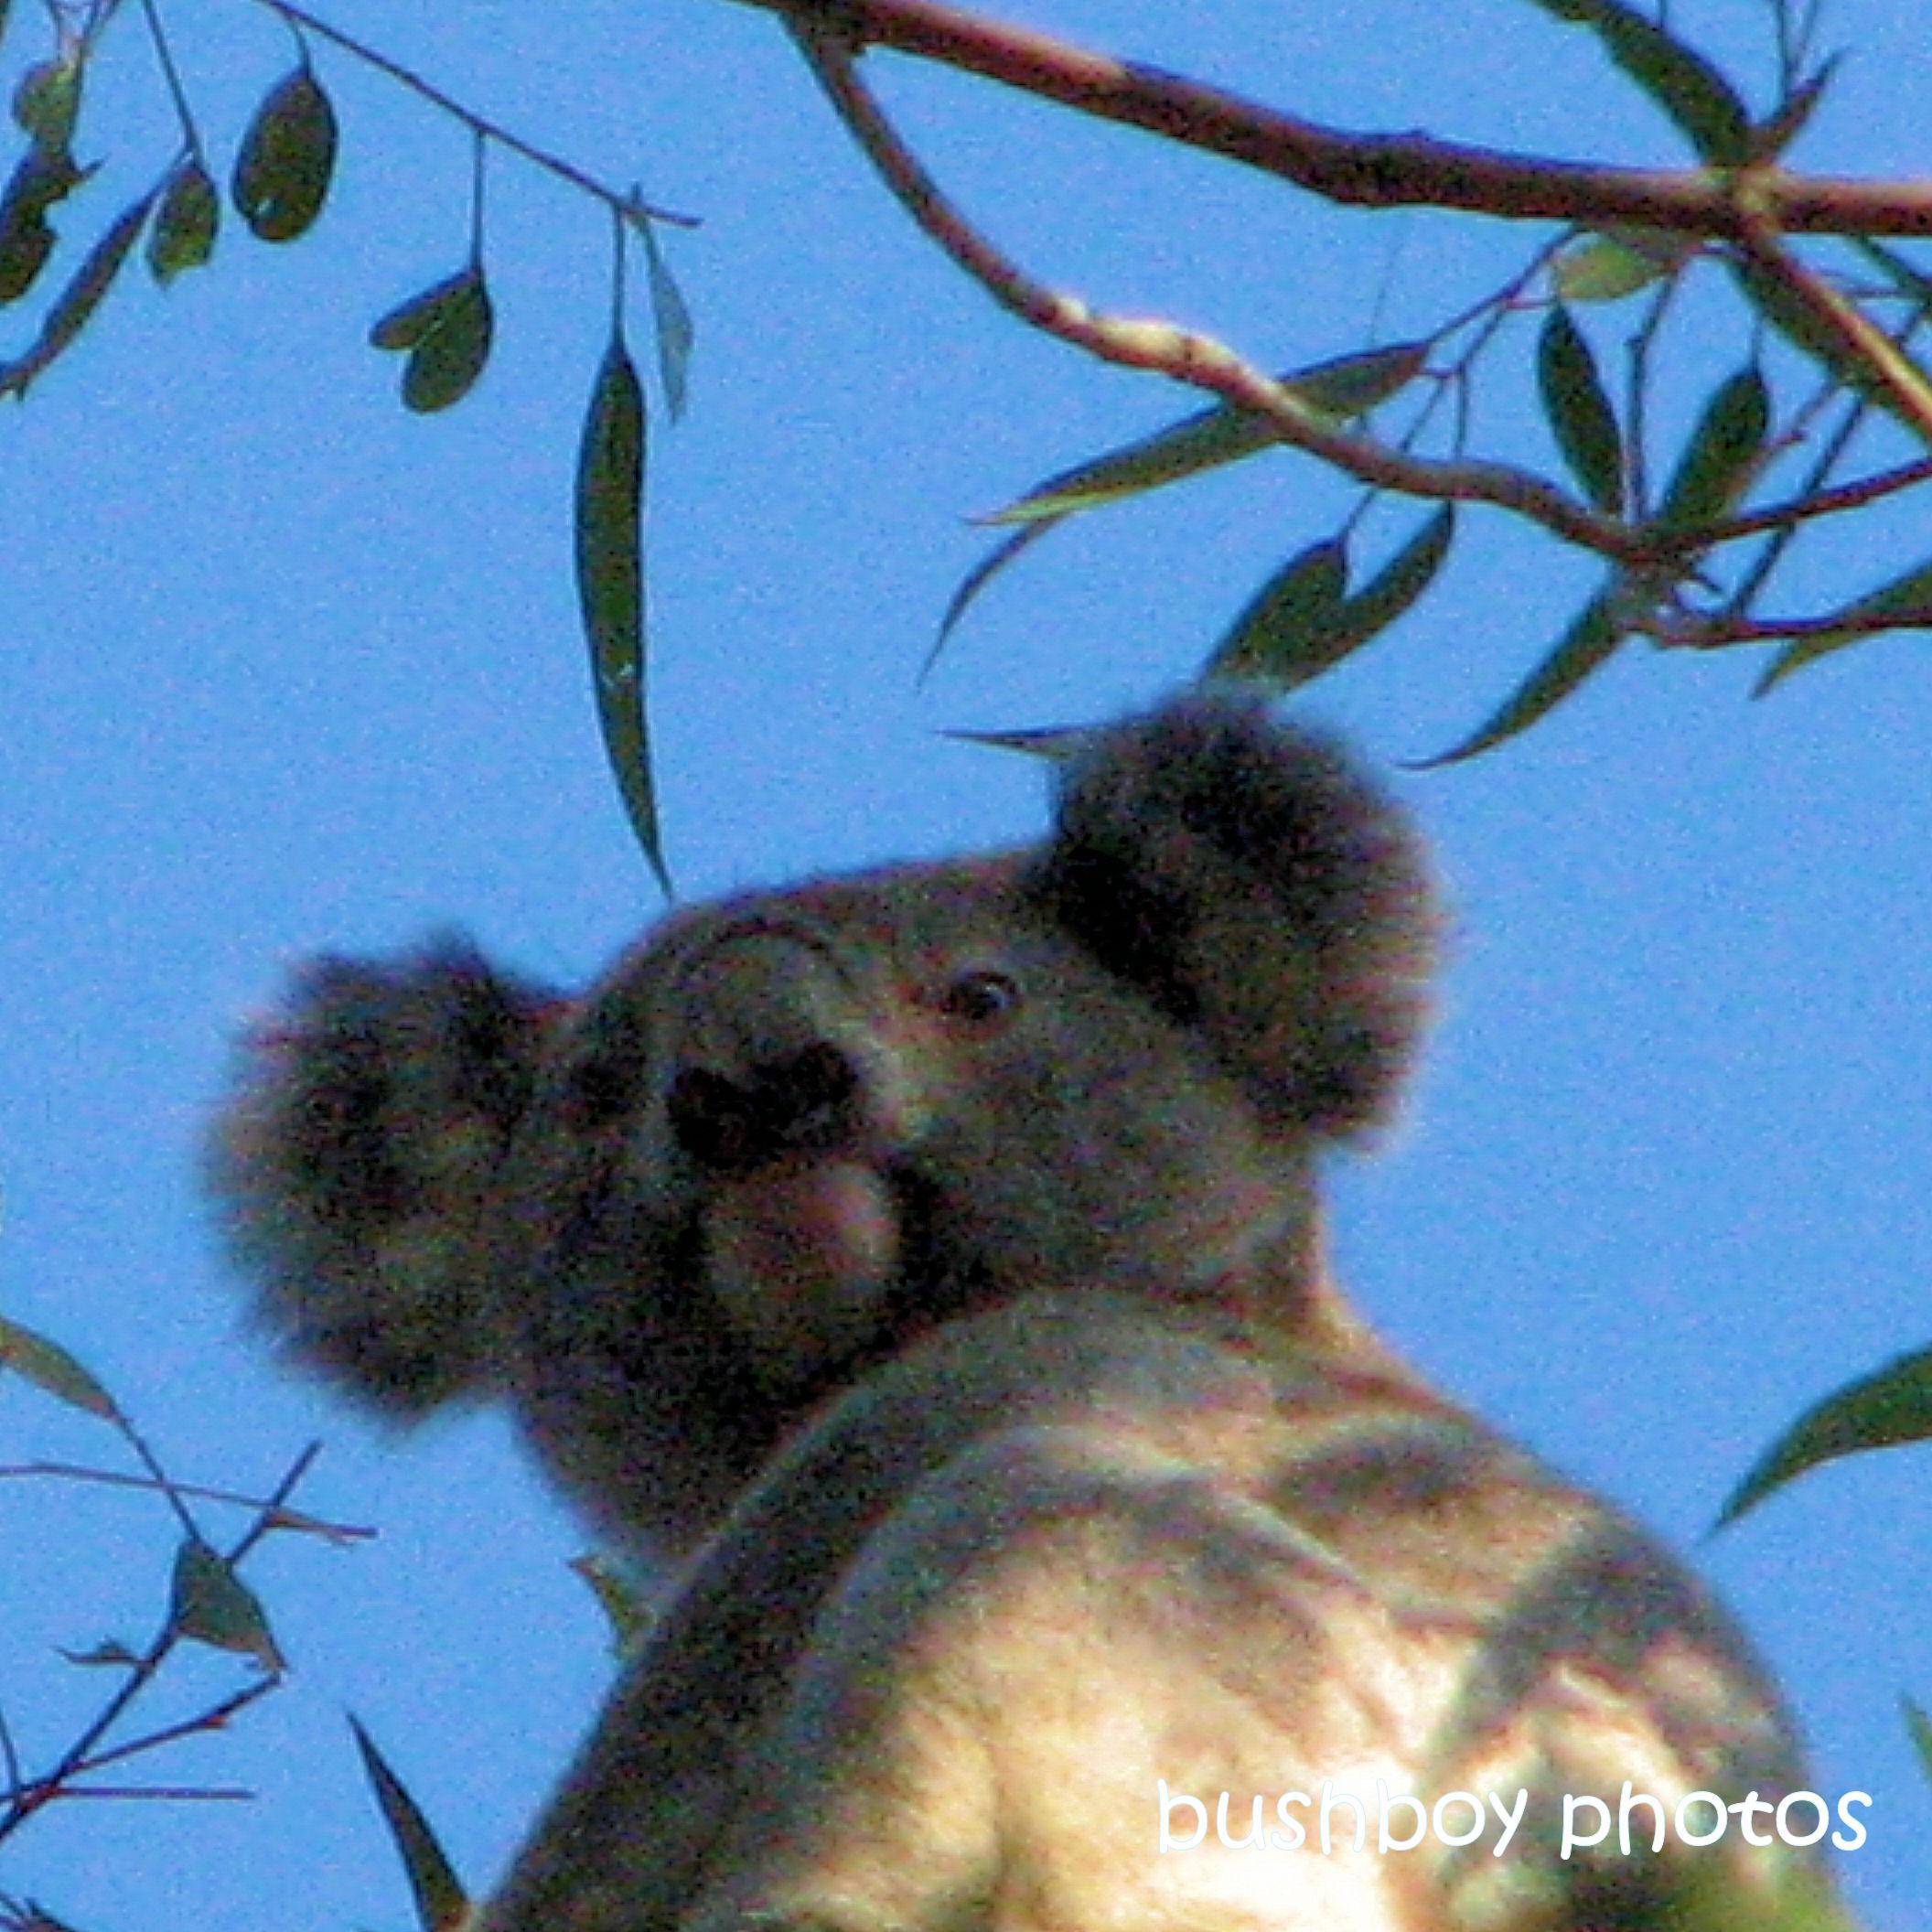 190703_blog_challenge_blue_koala